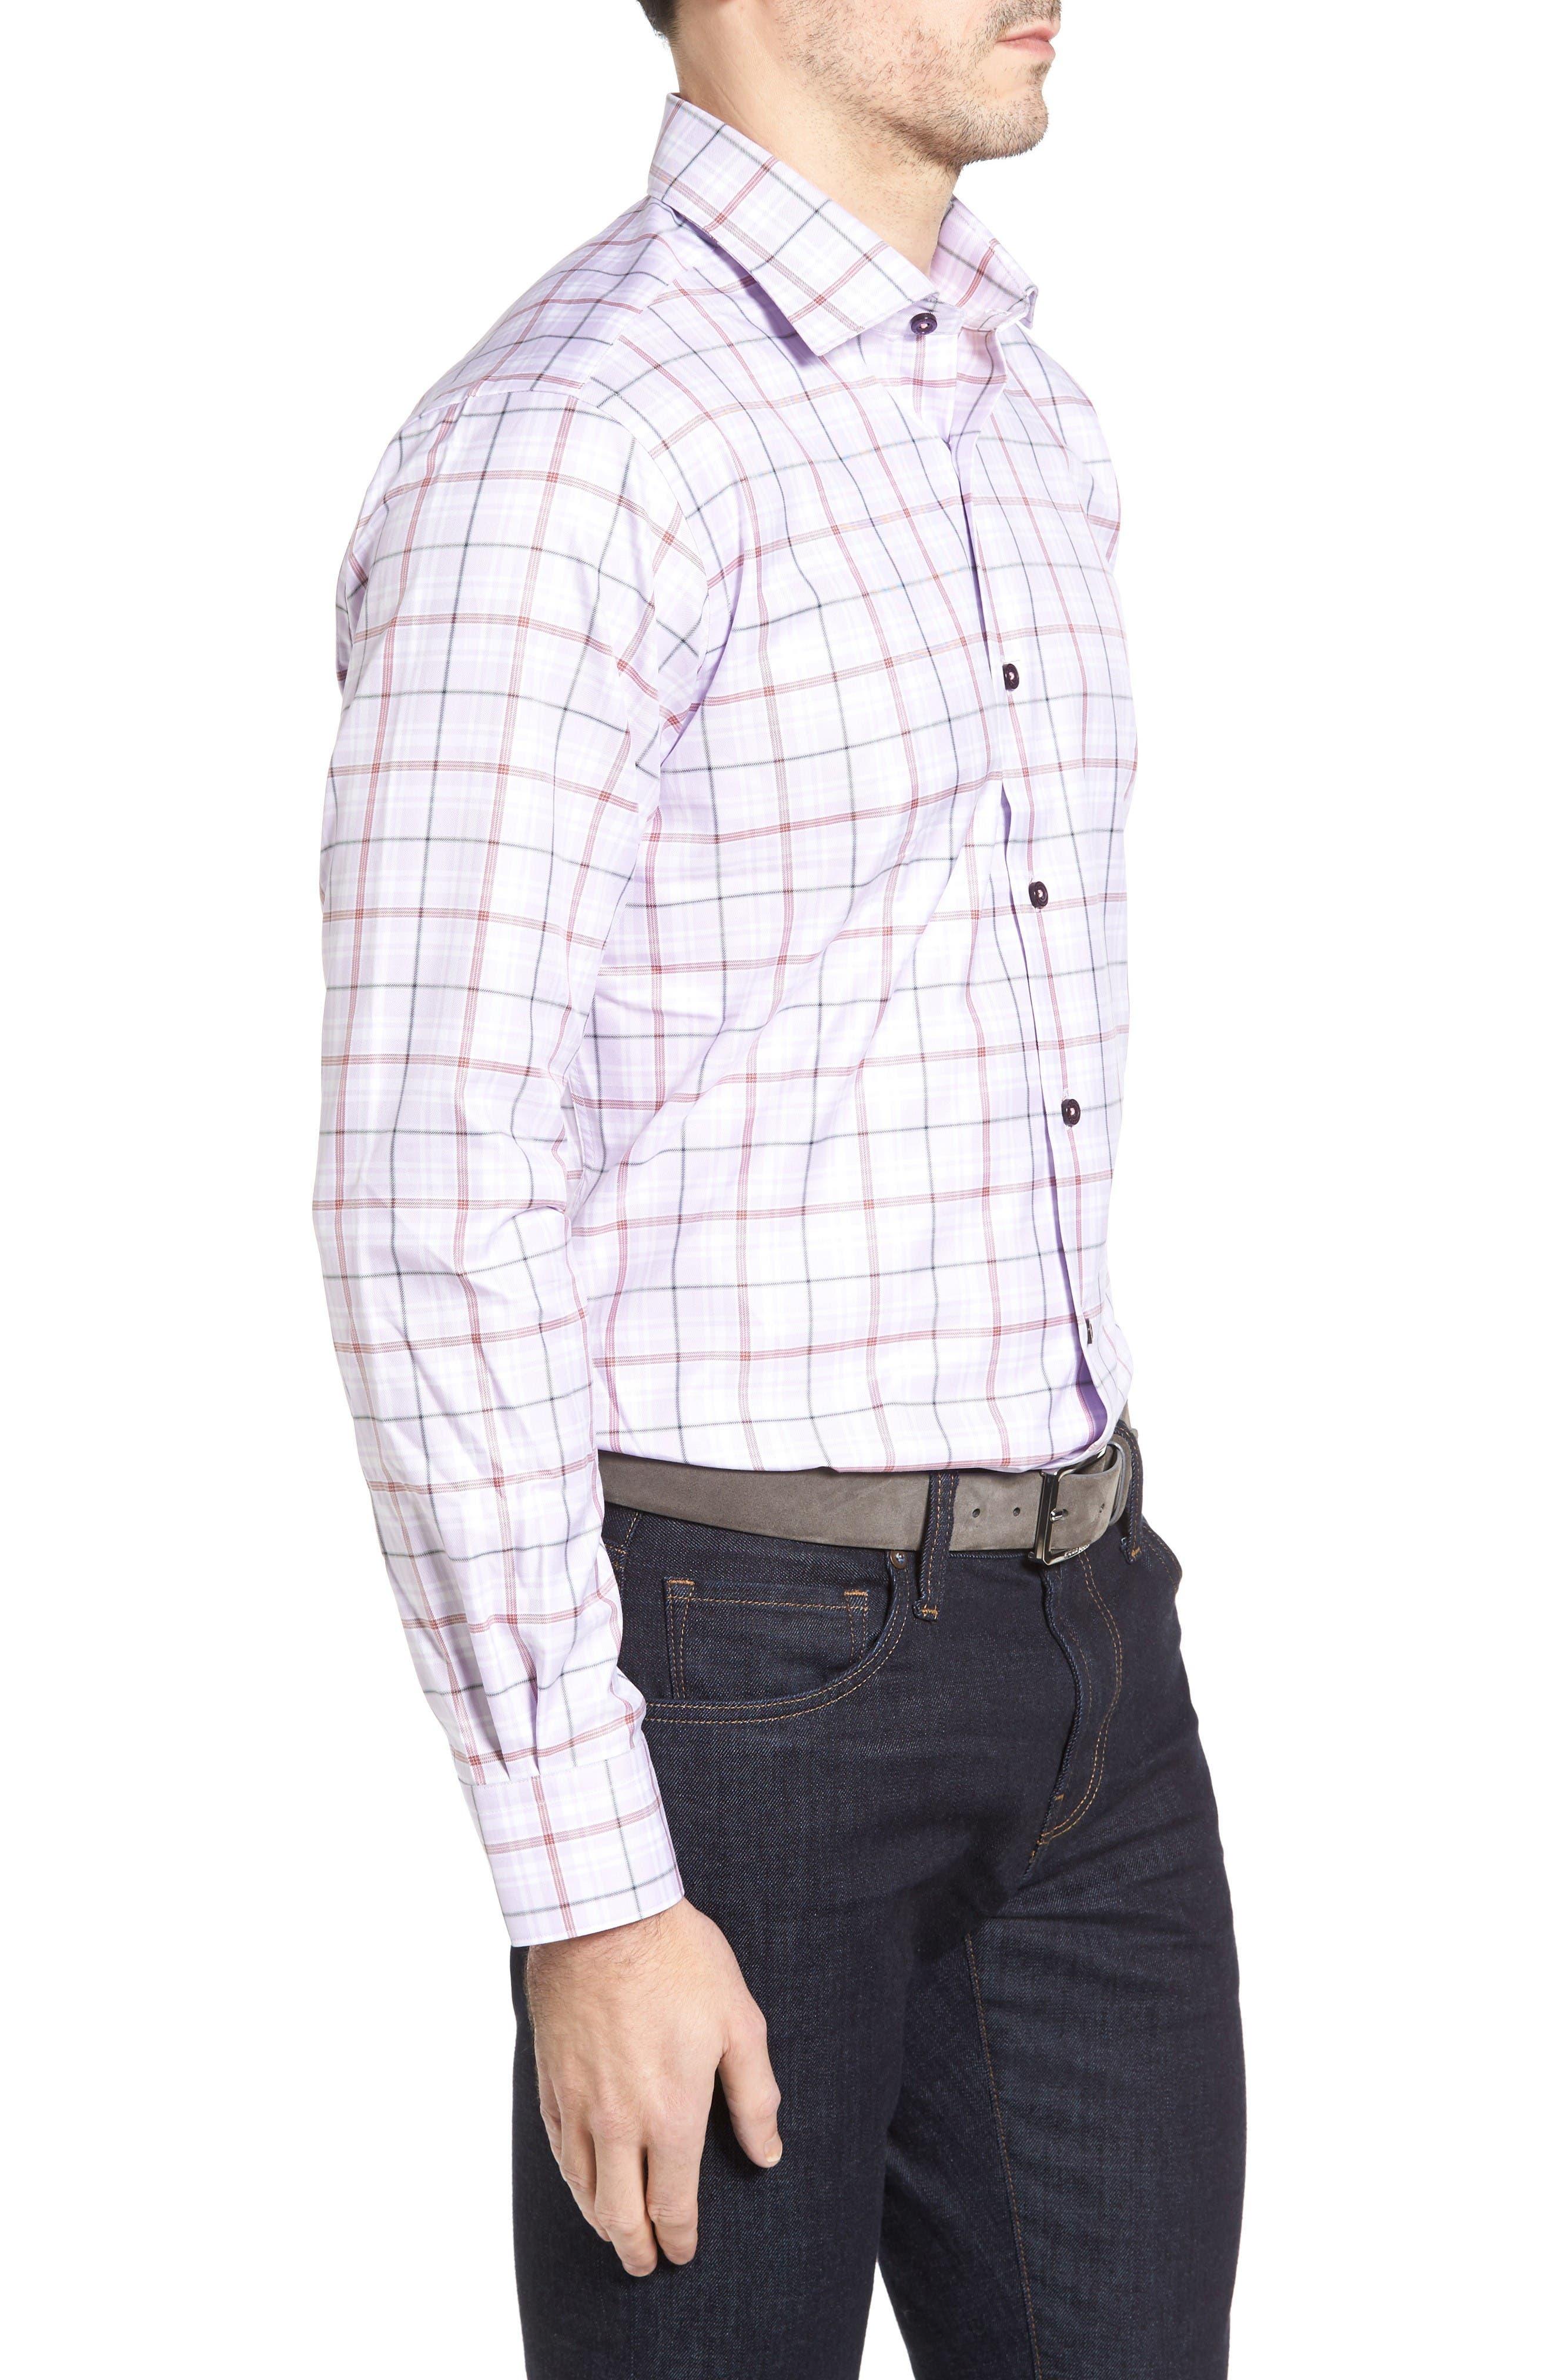 Crespi IV Tailored Fit Sport Shirt,                             Alternate thumbnail 3, color,                             Lavender